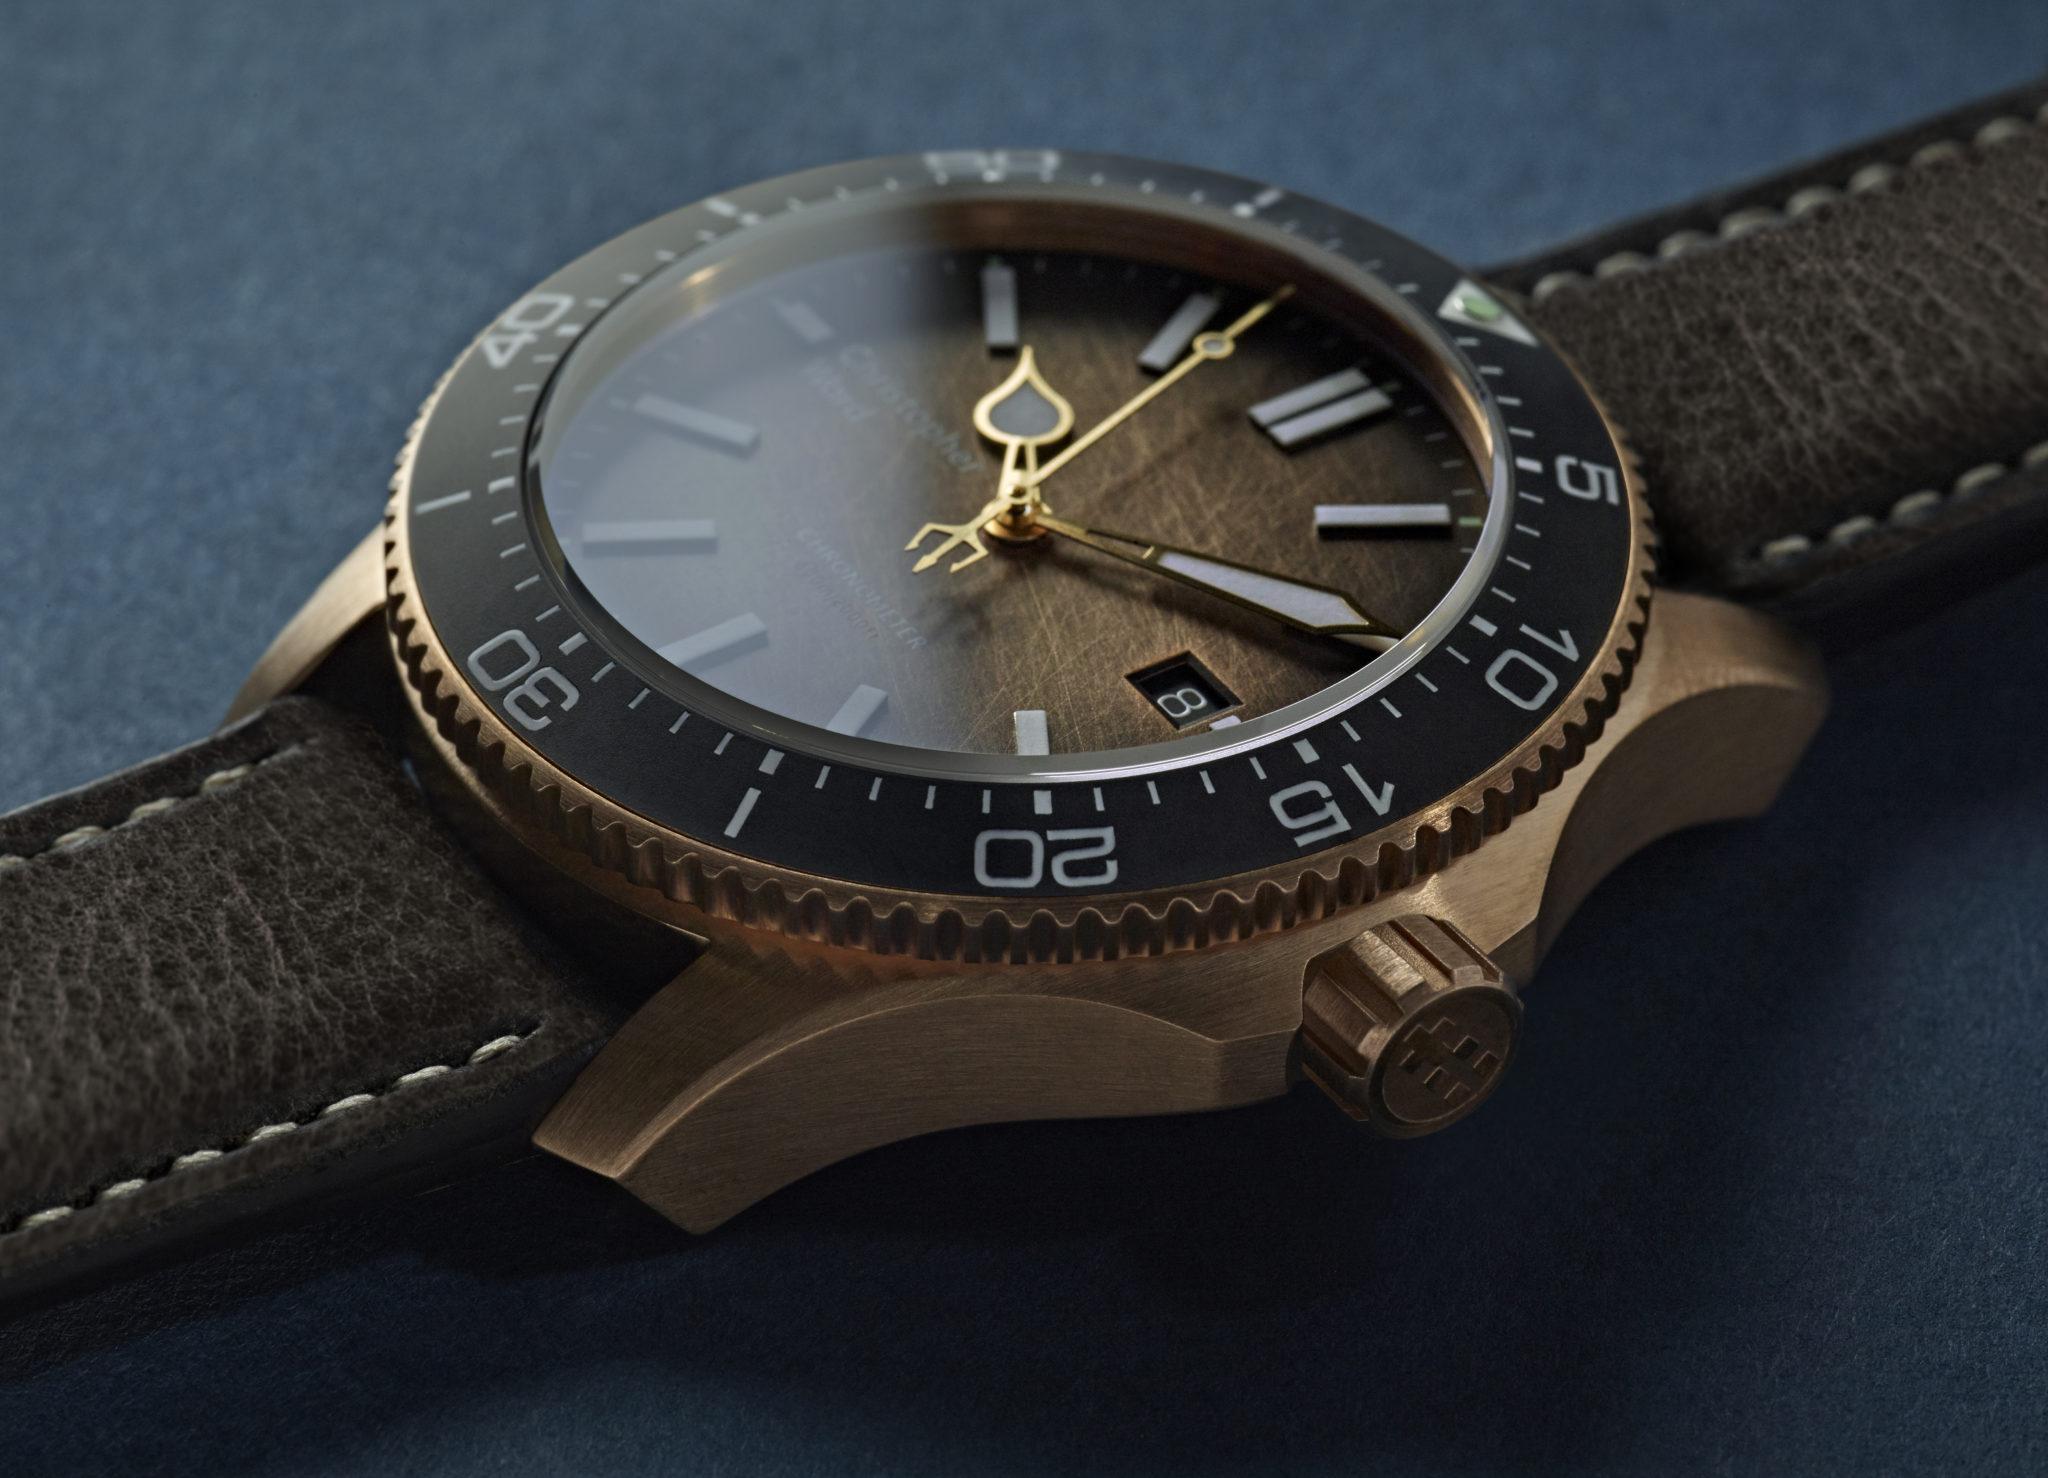 C60-43ADA2-B0KK0 leather